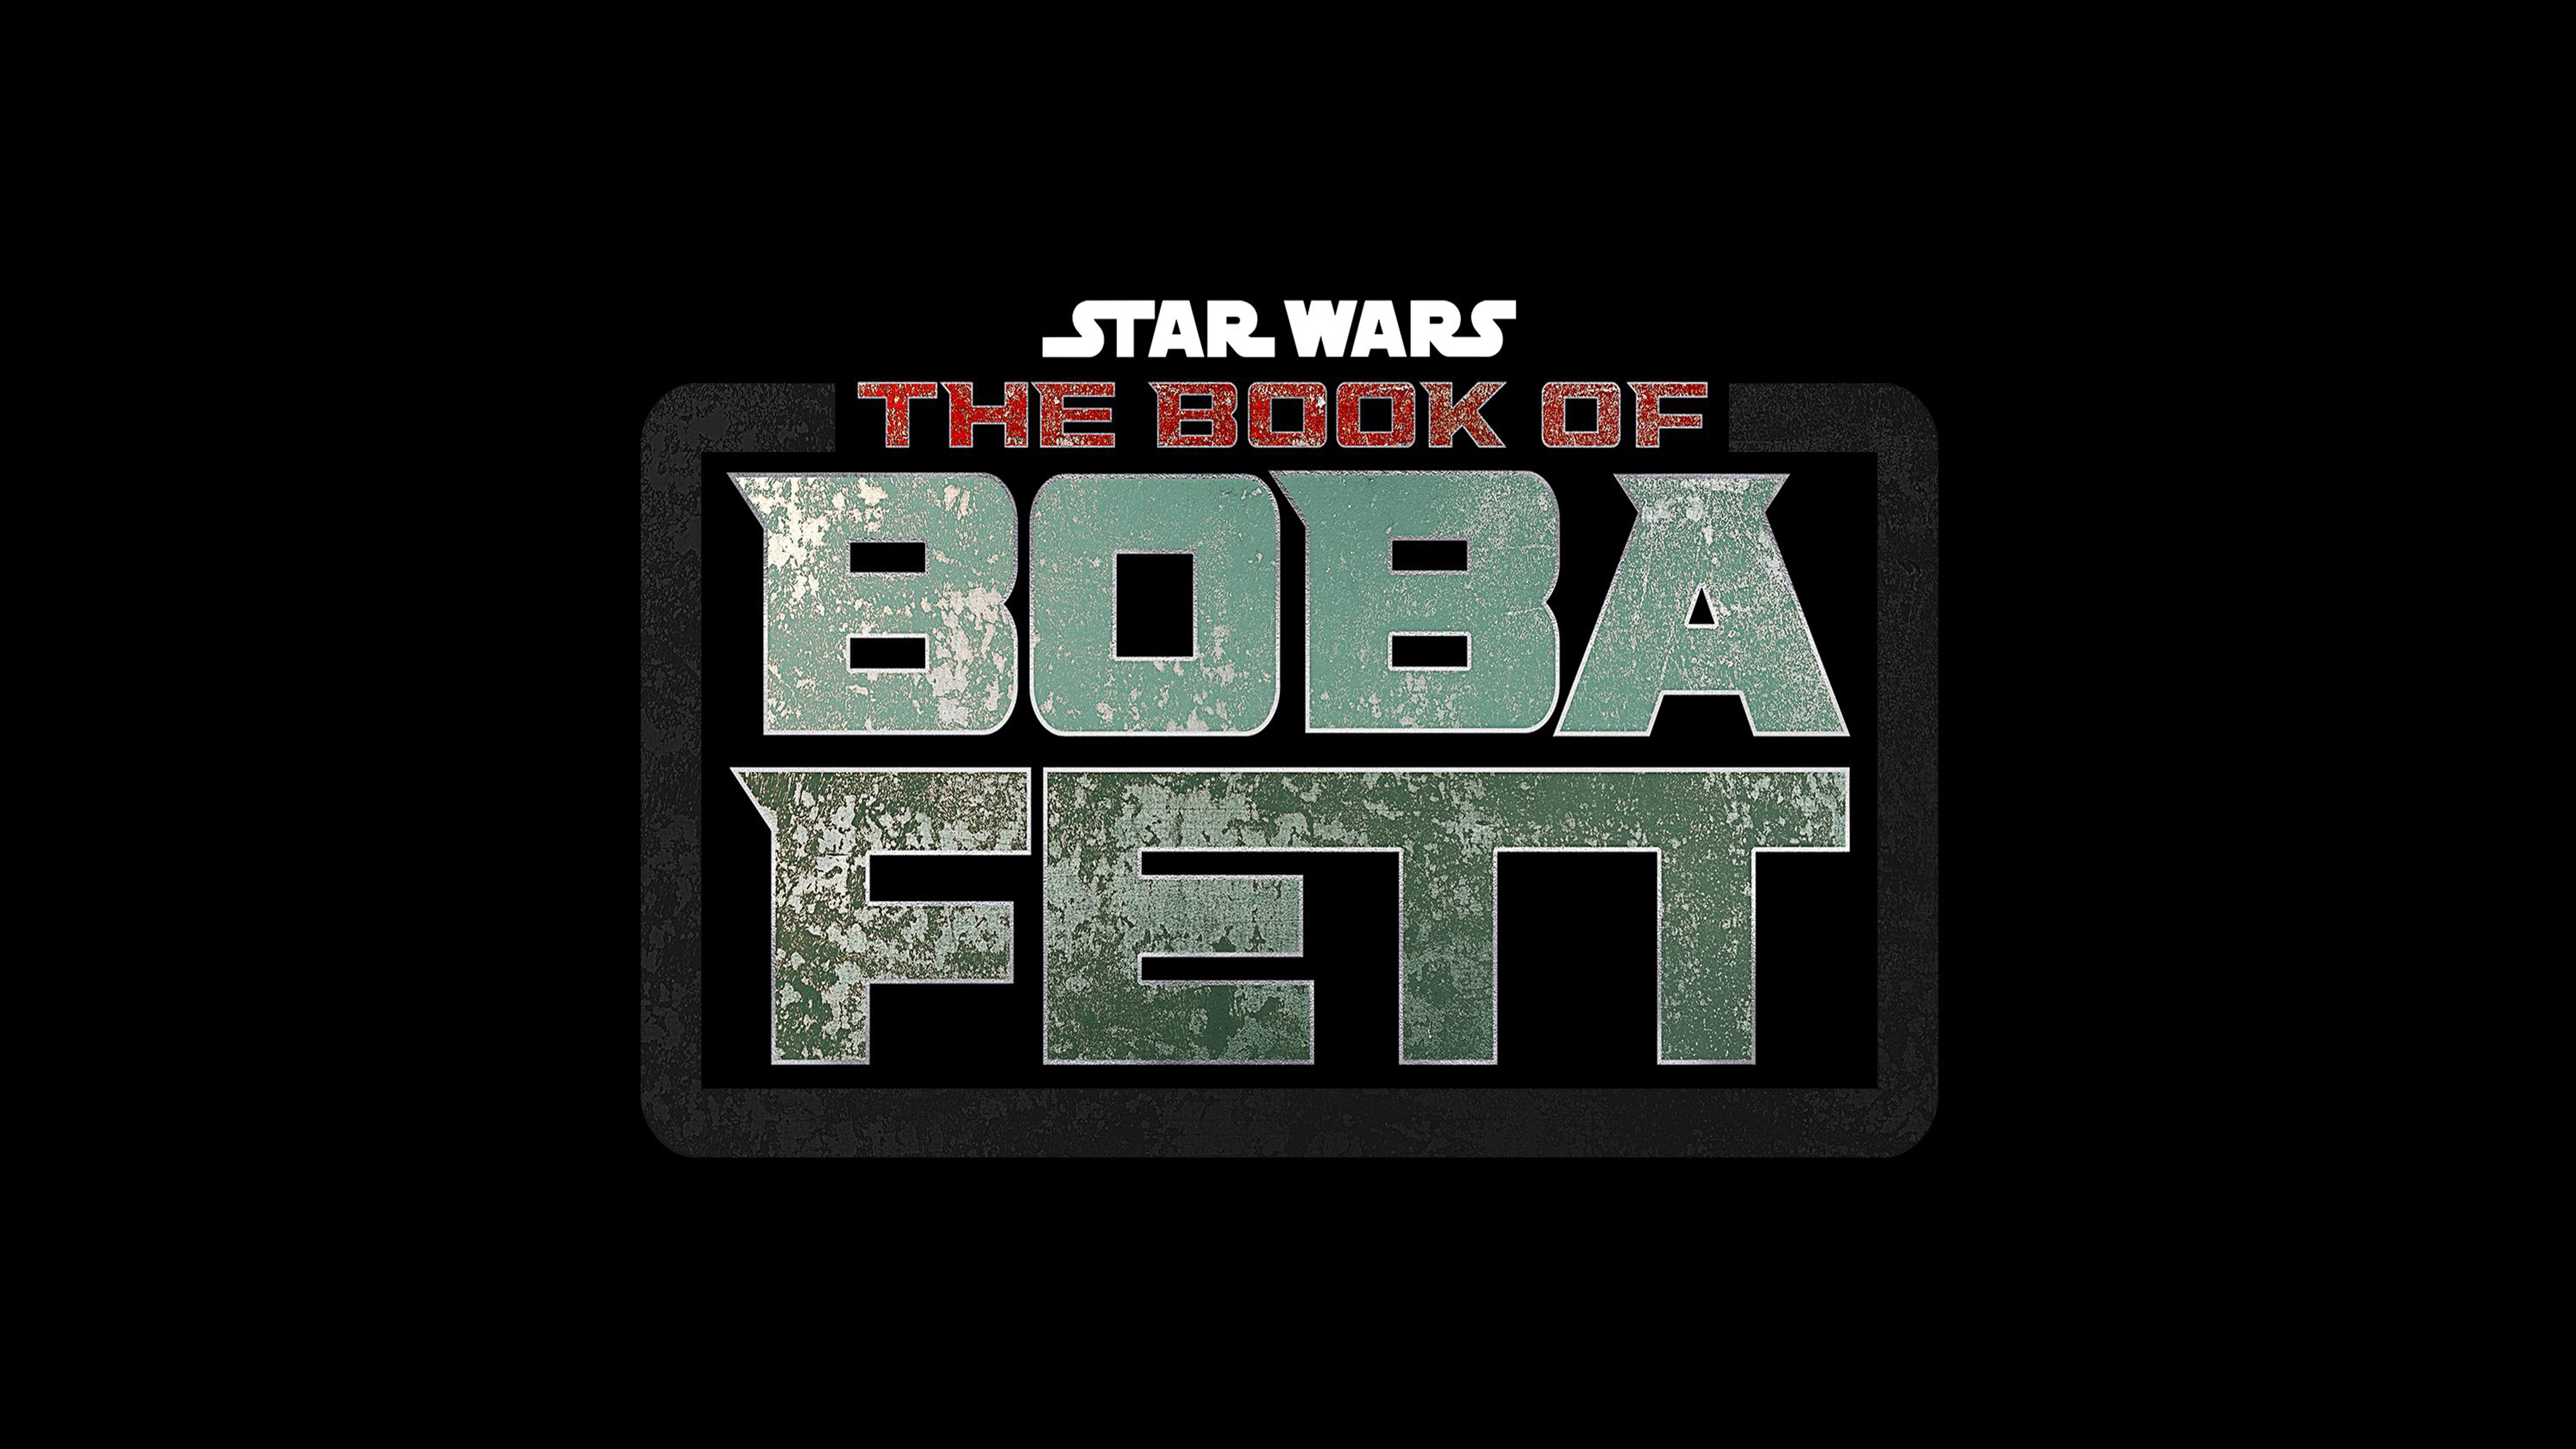 the book of boba fett 4k 1615203997 - The Book Of Boba Fett 4k - The Book Of Boba Fett 4k wallpapers